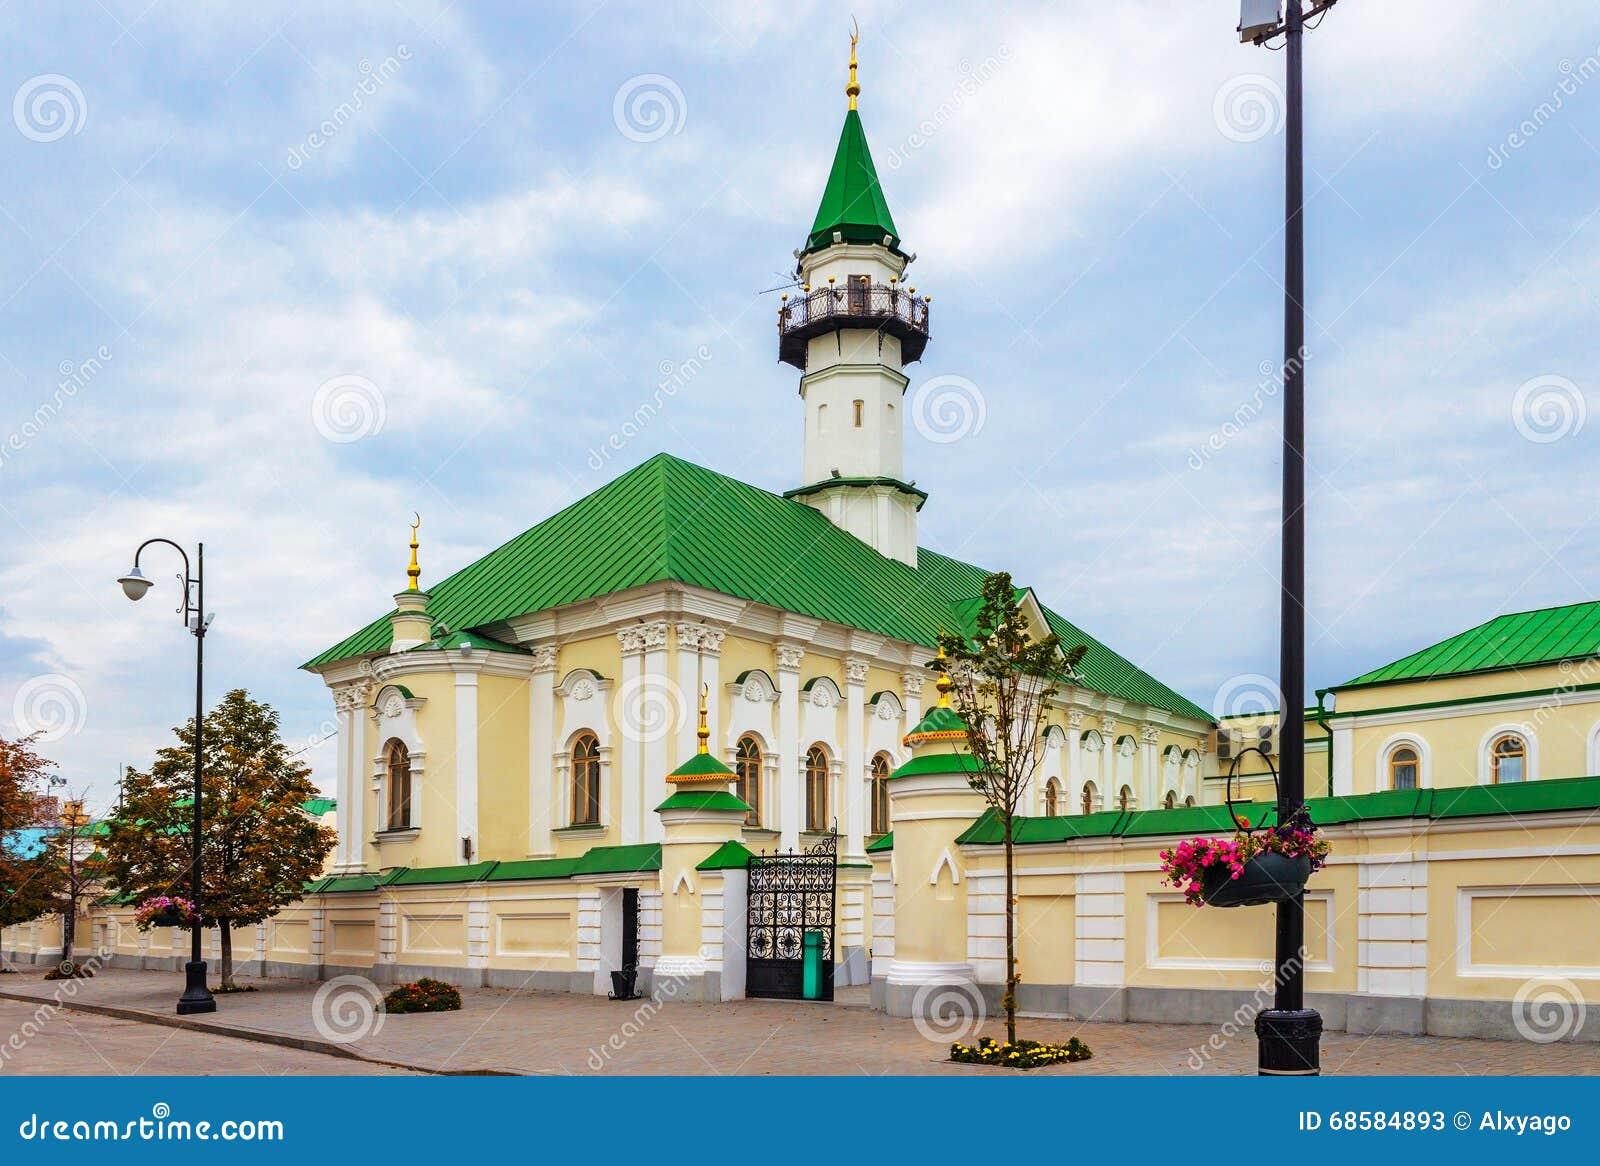 Al Marjani - mosque in Kazan: description, history, relics and shrines 42